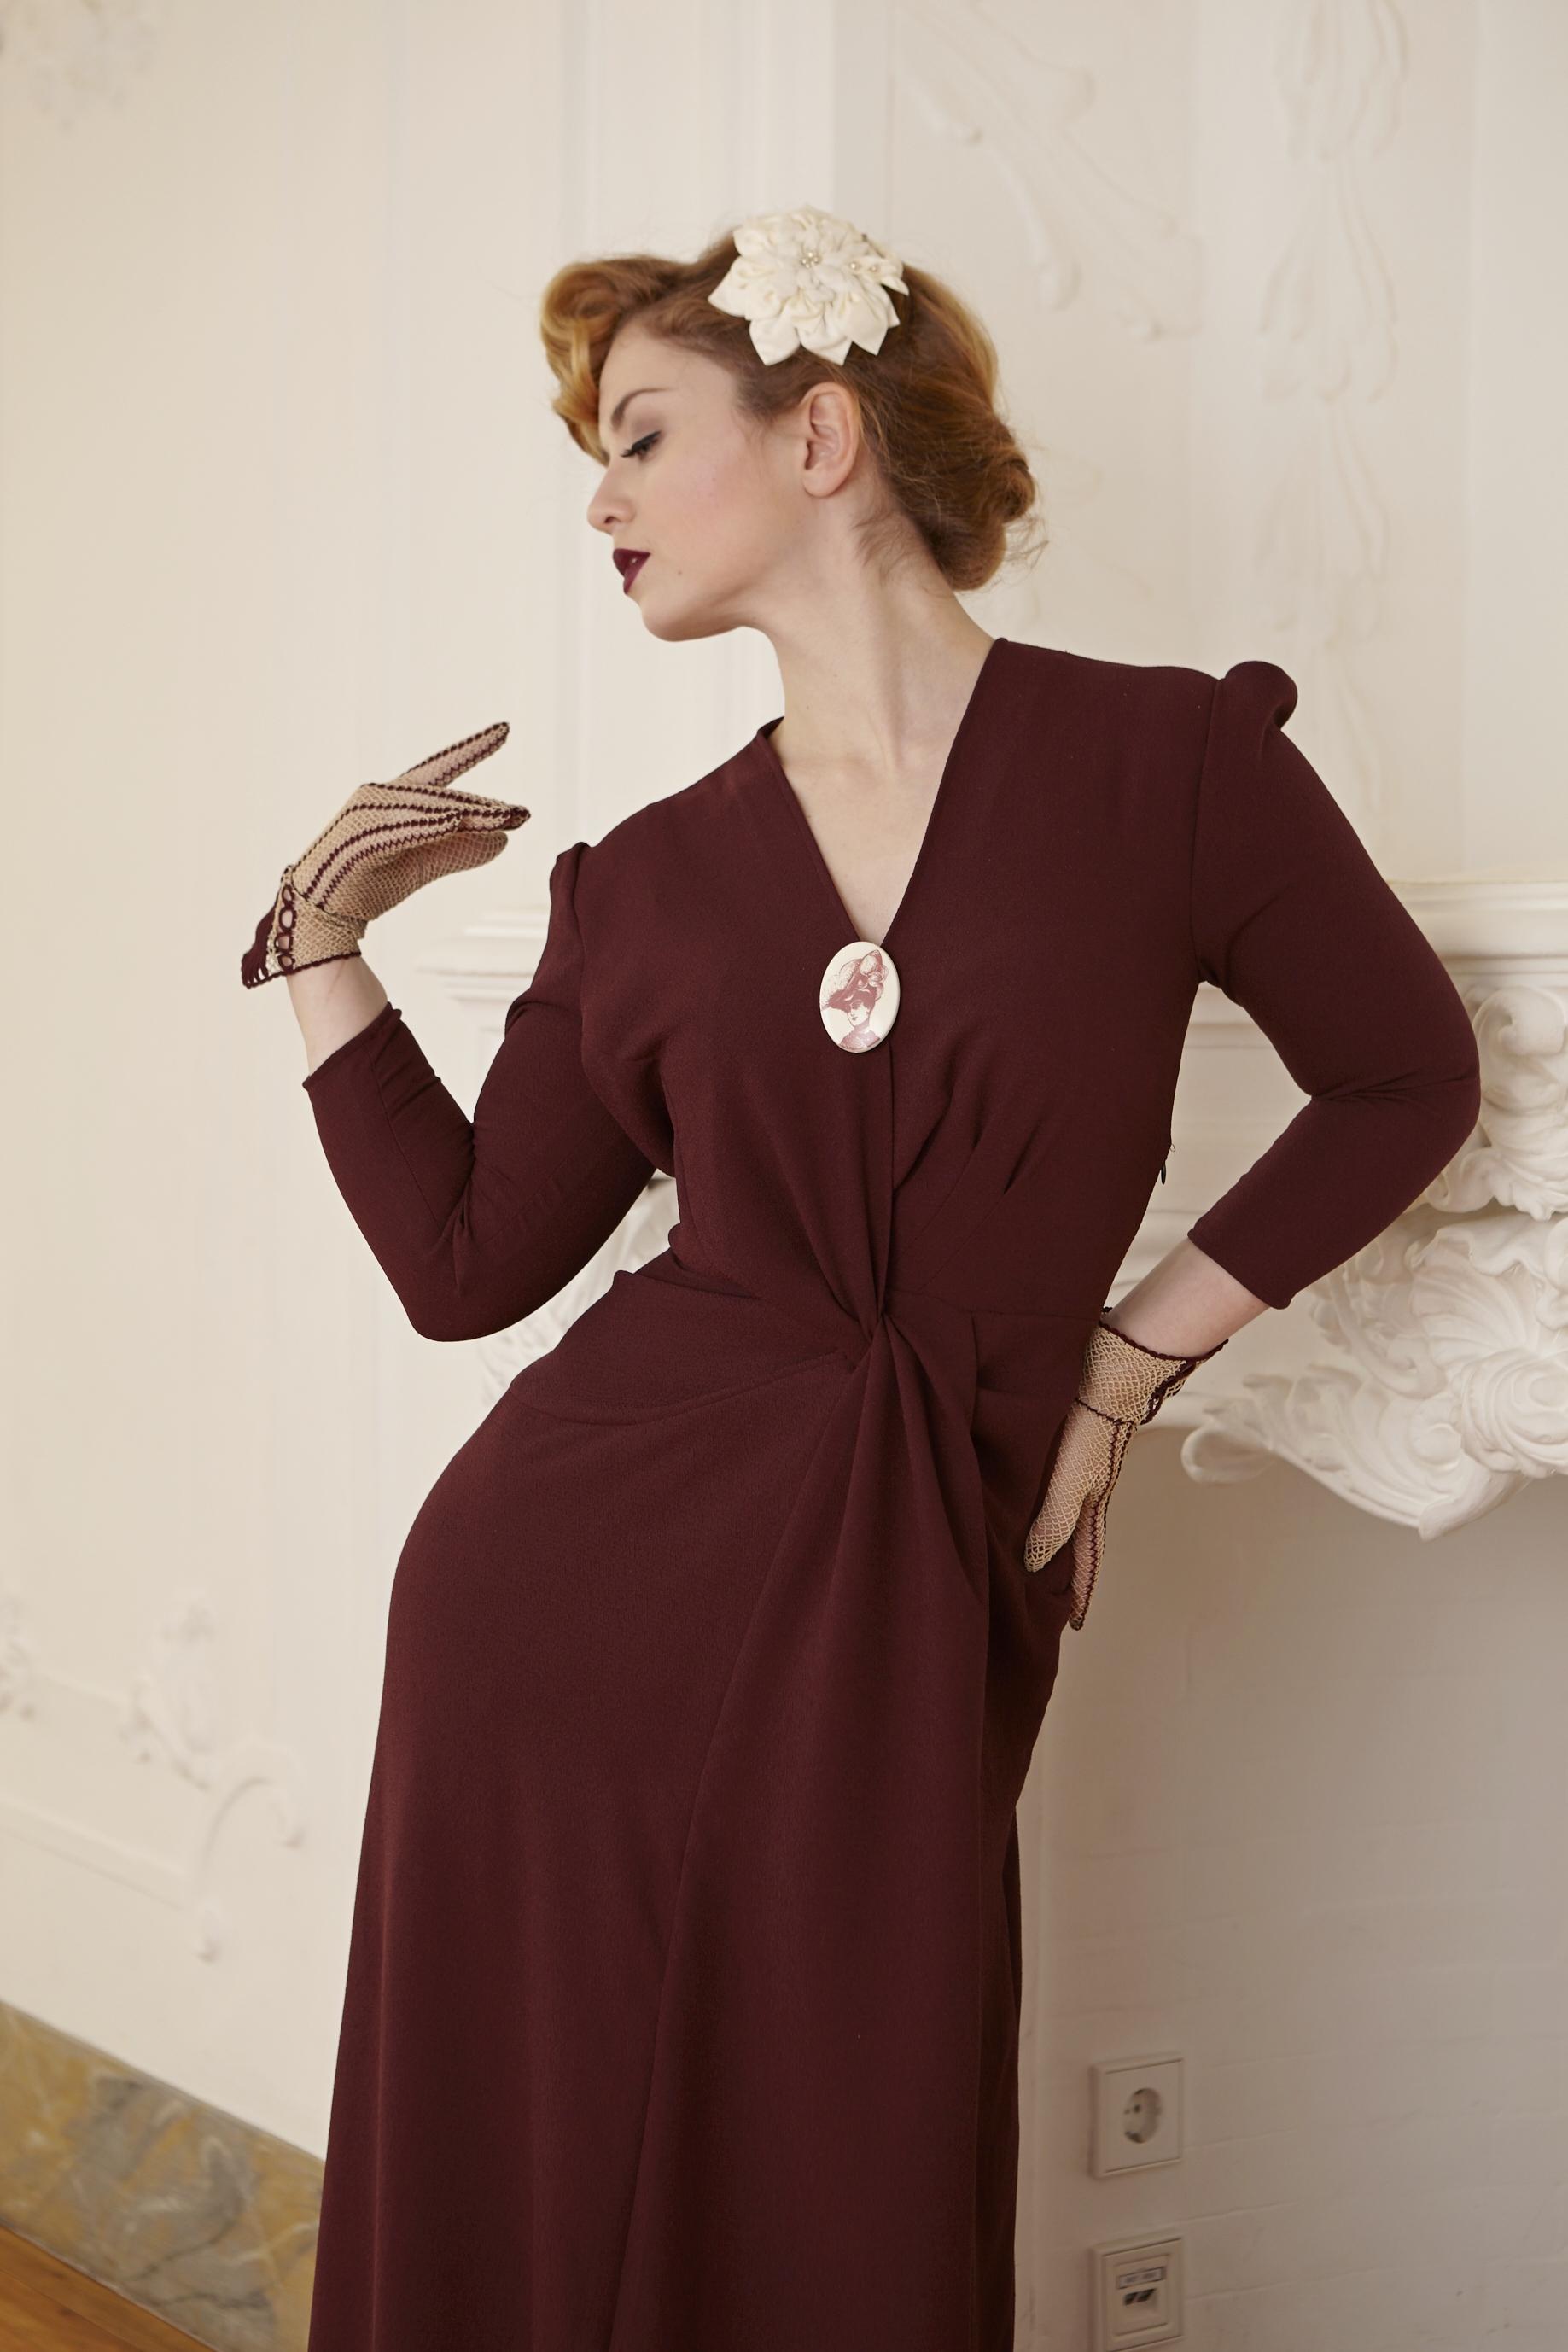 30ies evening gown detail